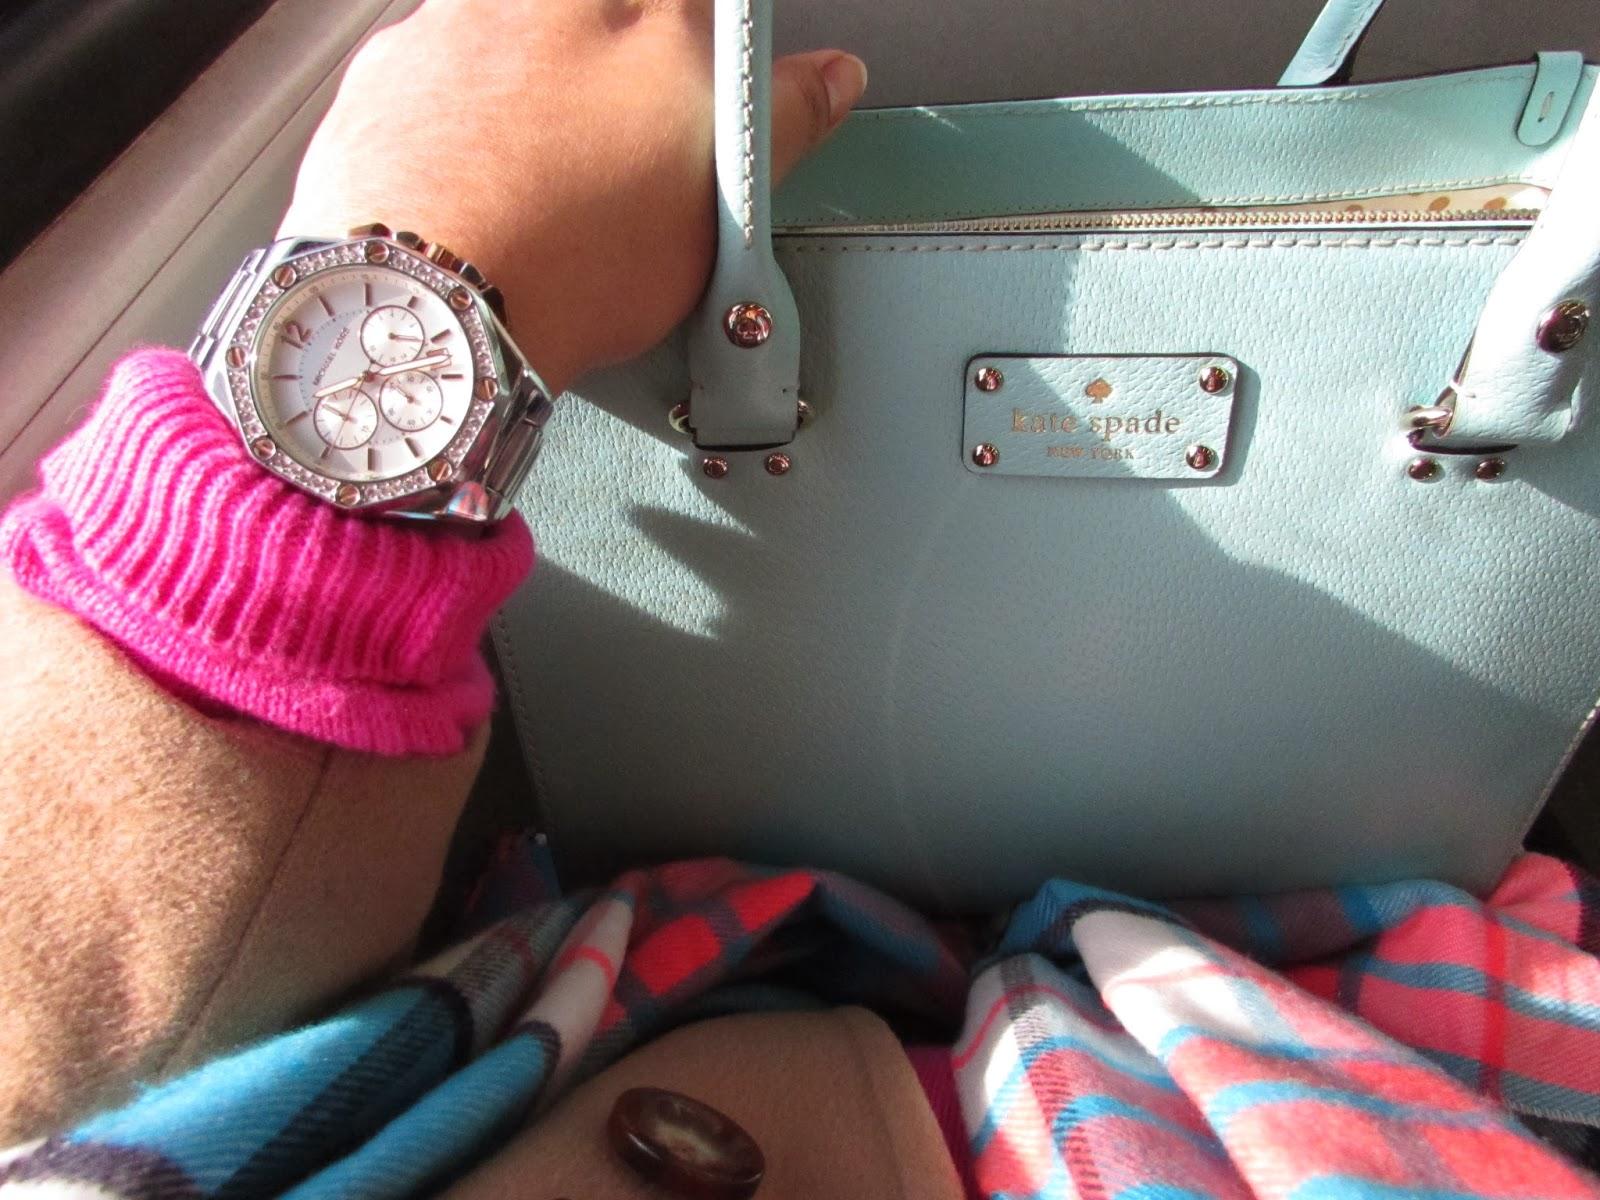 Kate Spade Michael Kors Bag Watch